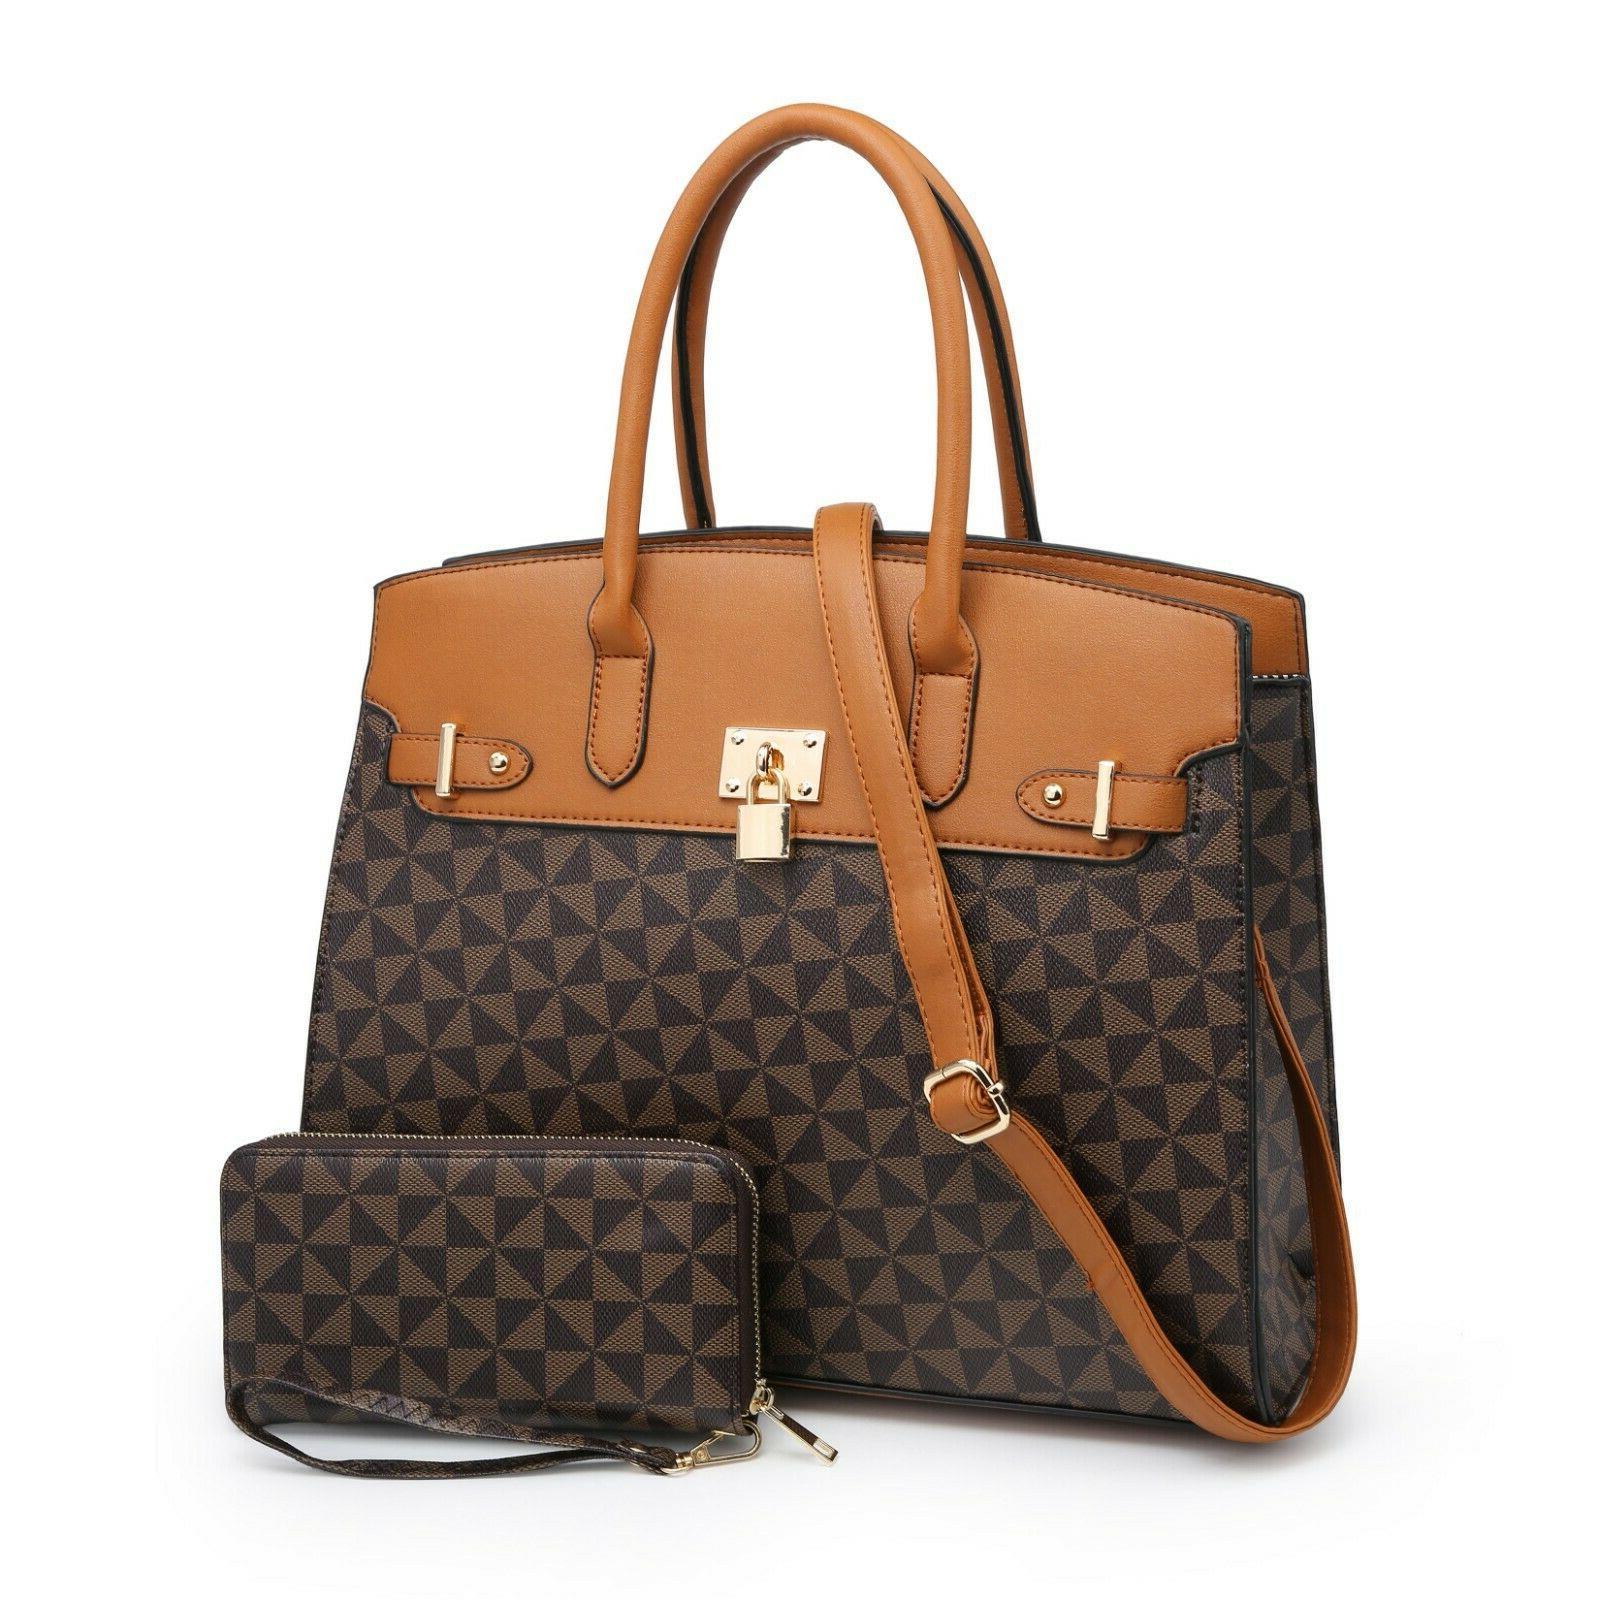 Women Large Satchel Work Hand Bag Shoulder Tote Bag Purse/Wa